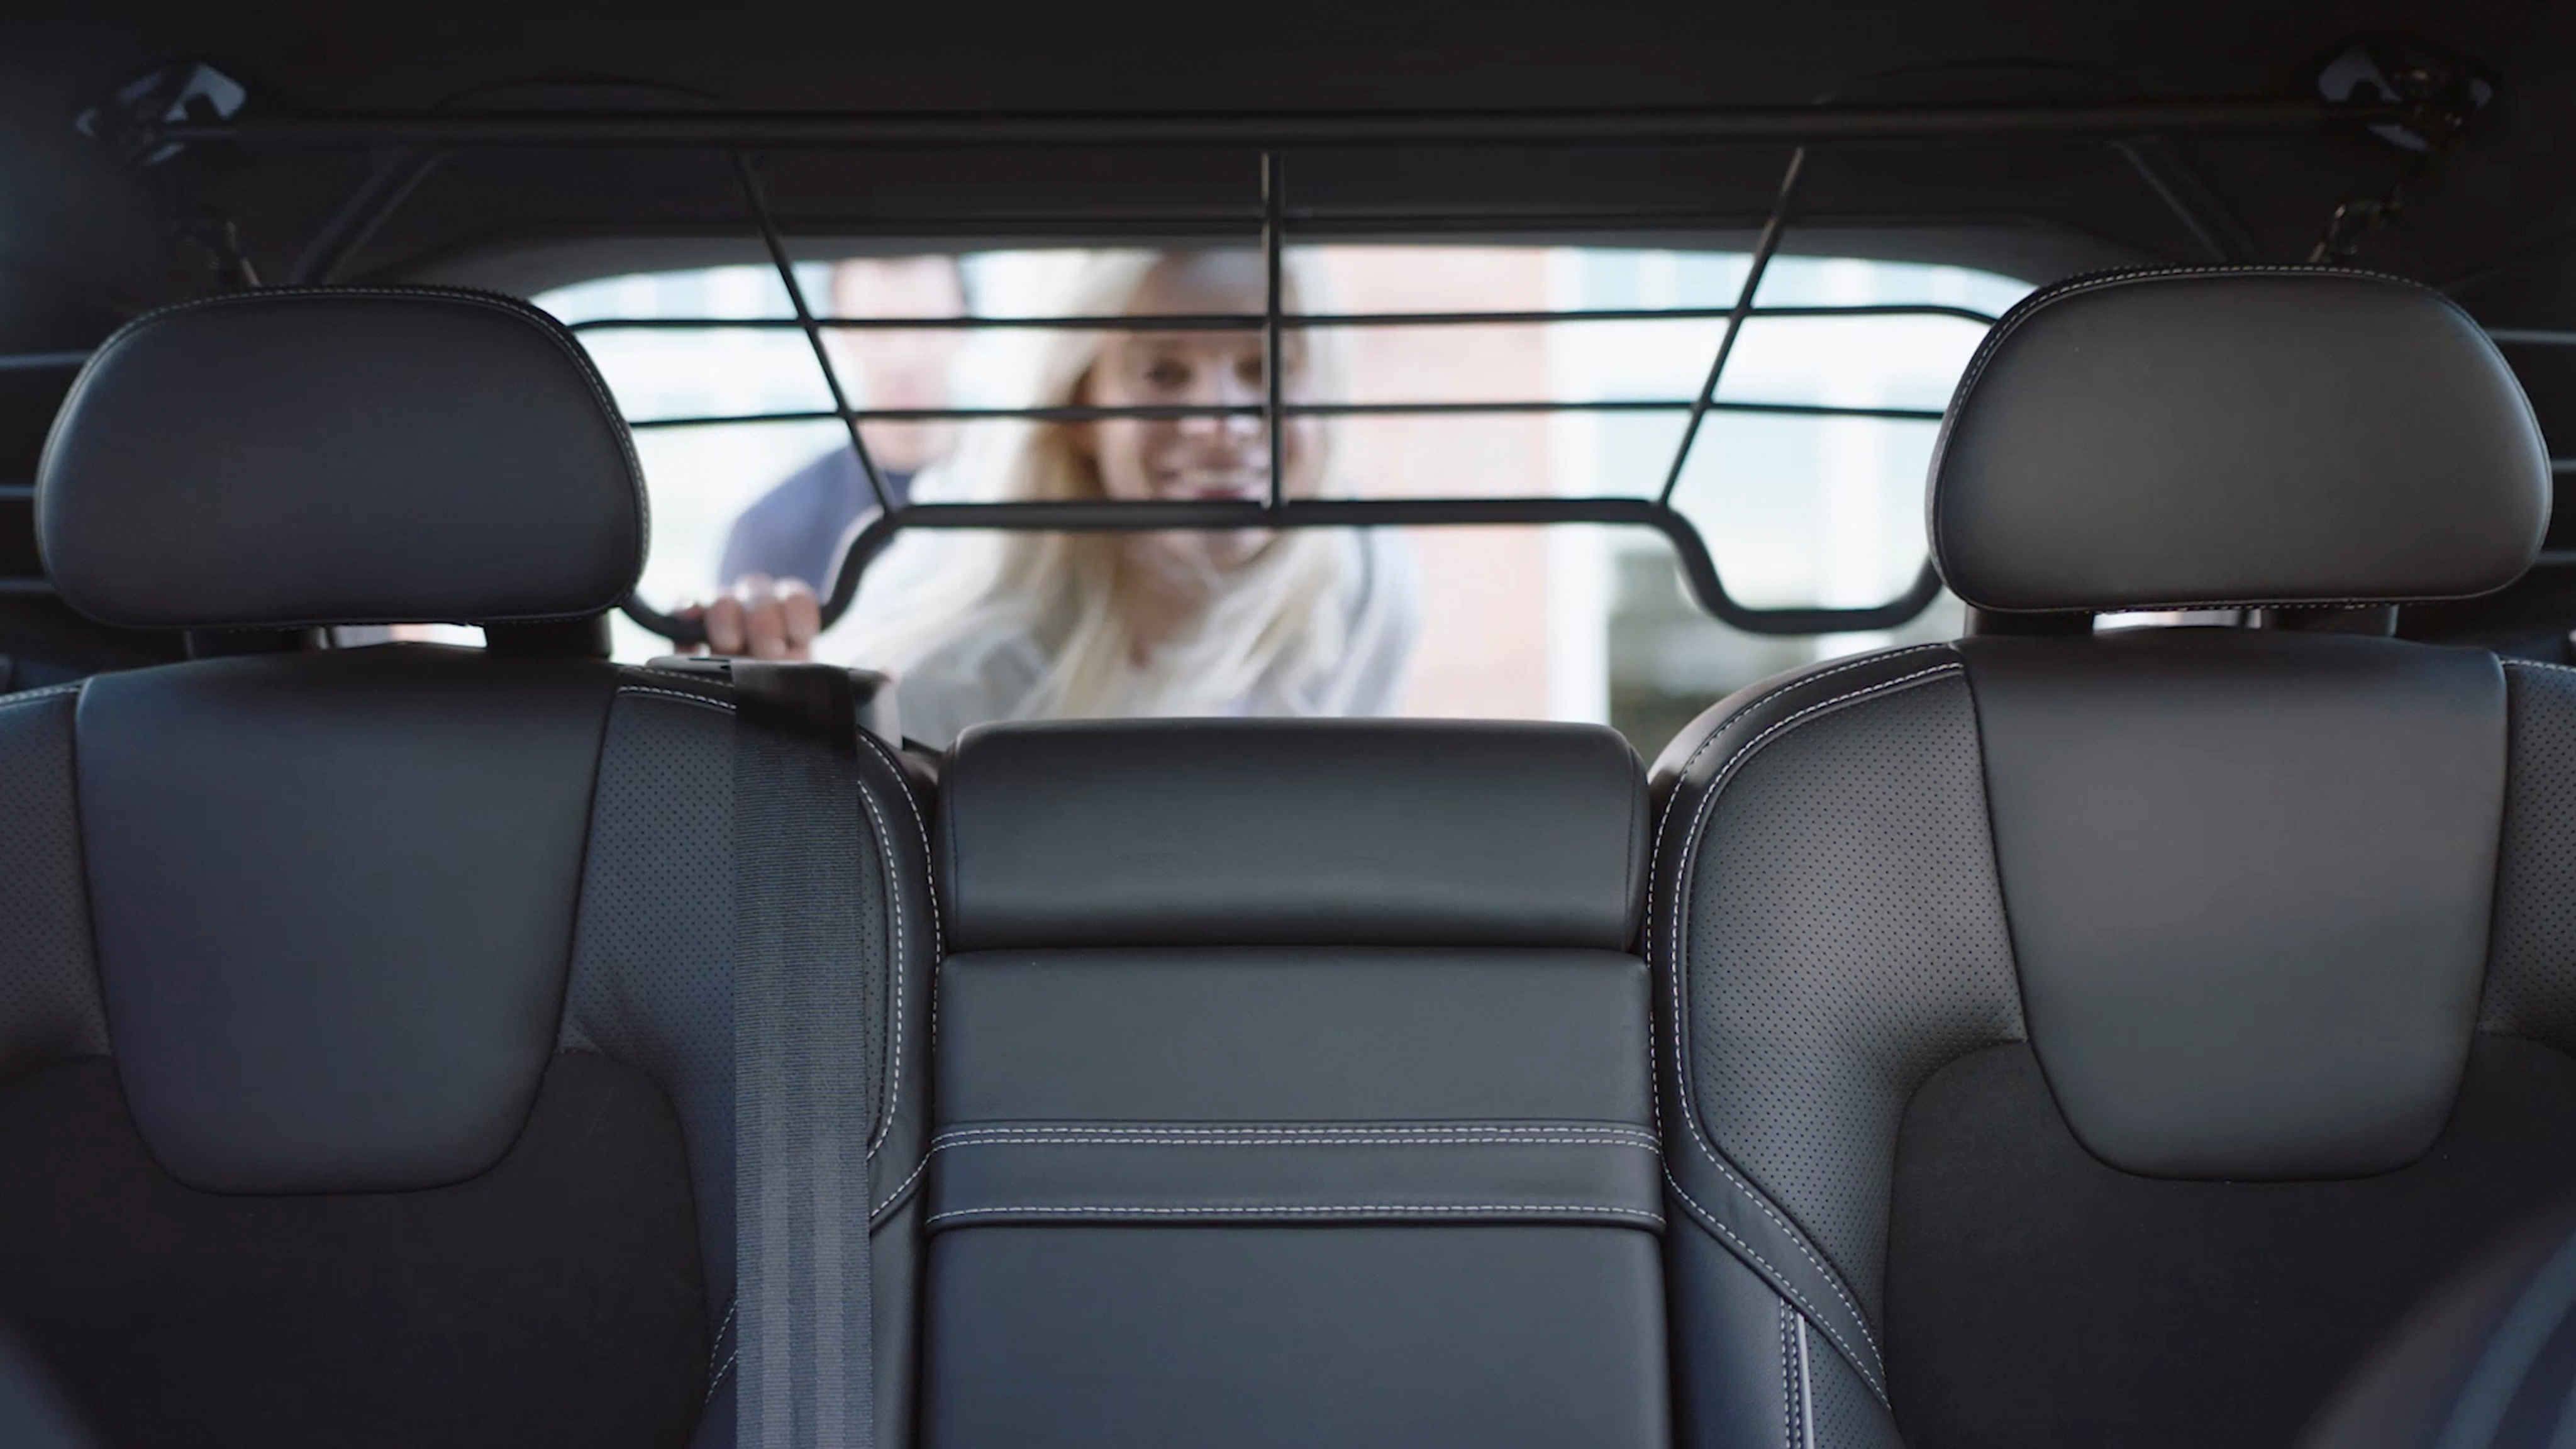 1ba6be85d15 Auto Isofix Kinnitused | Rasketehnika Ee Mini Cooper S Chili Led 2 141kw